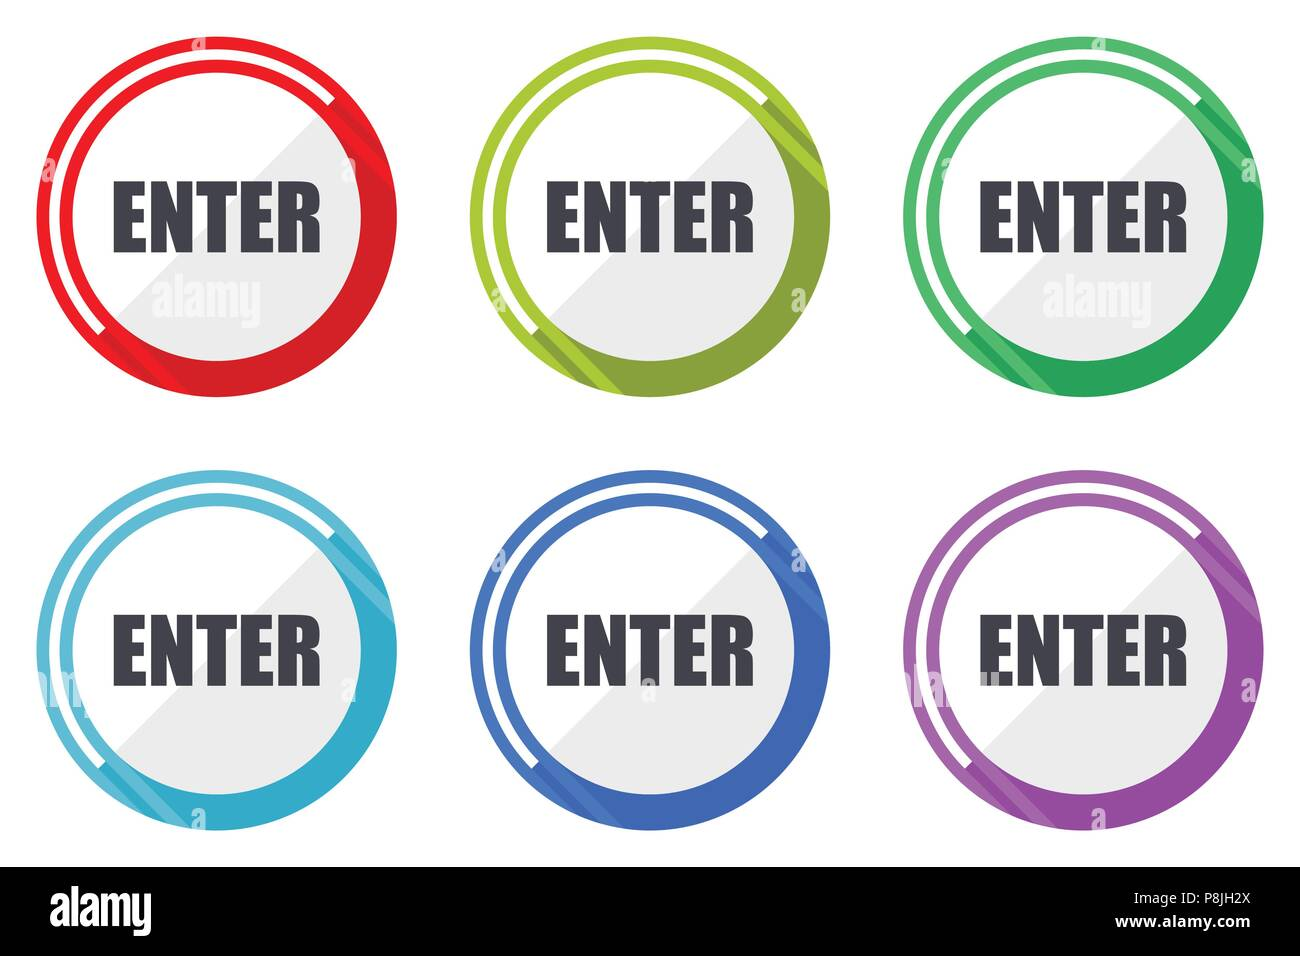 Enter Vector Icons Set Of Colorful Flat Design Internet Symbols On